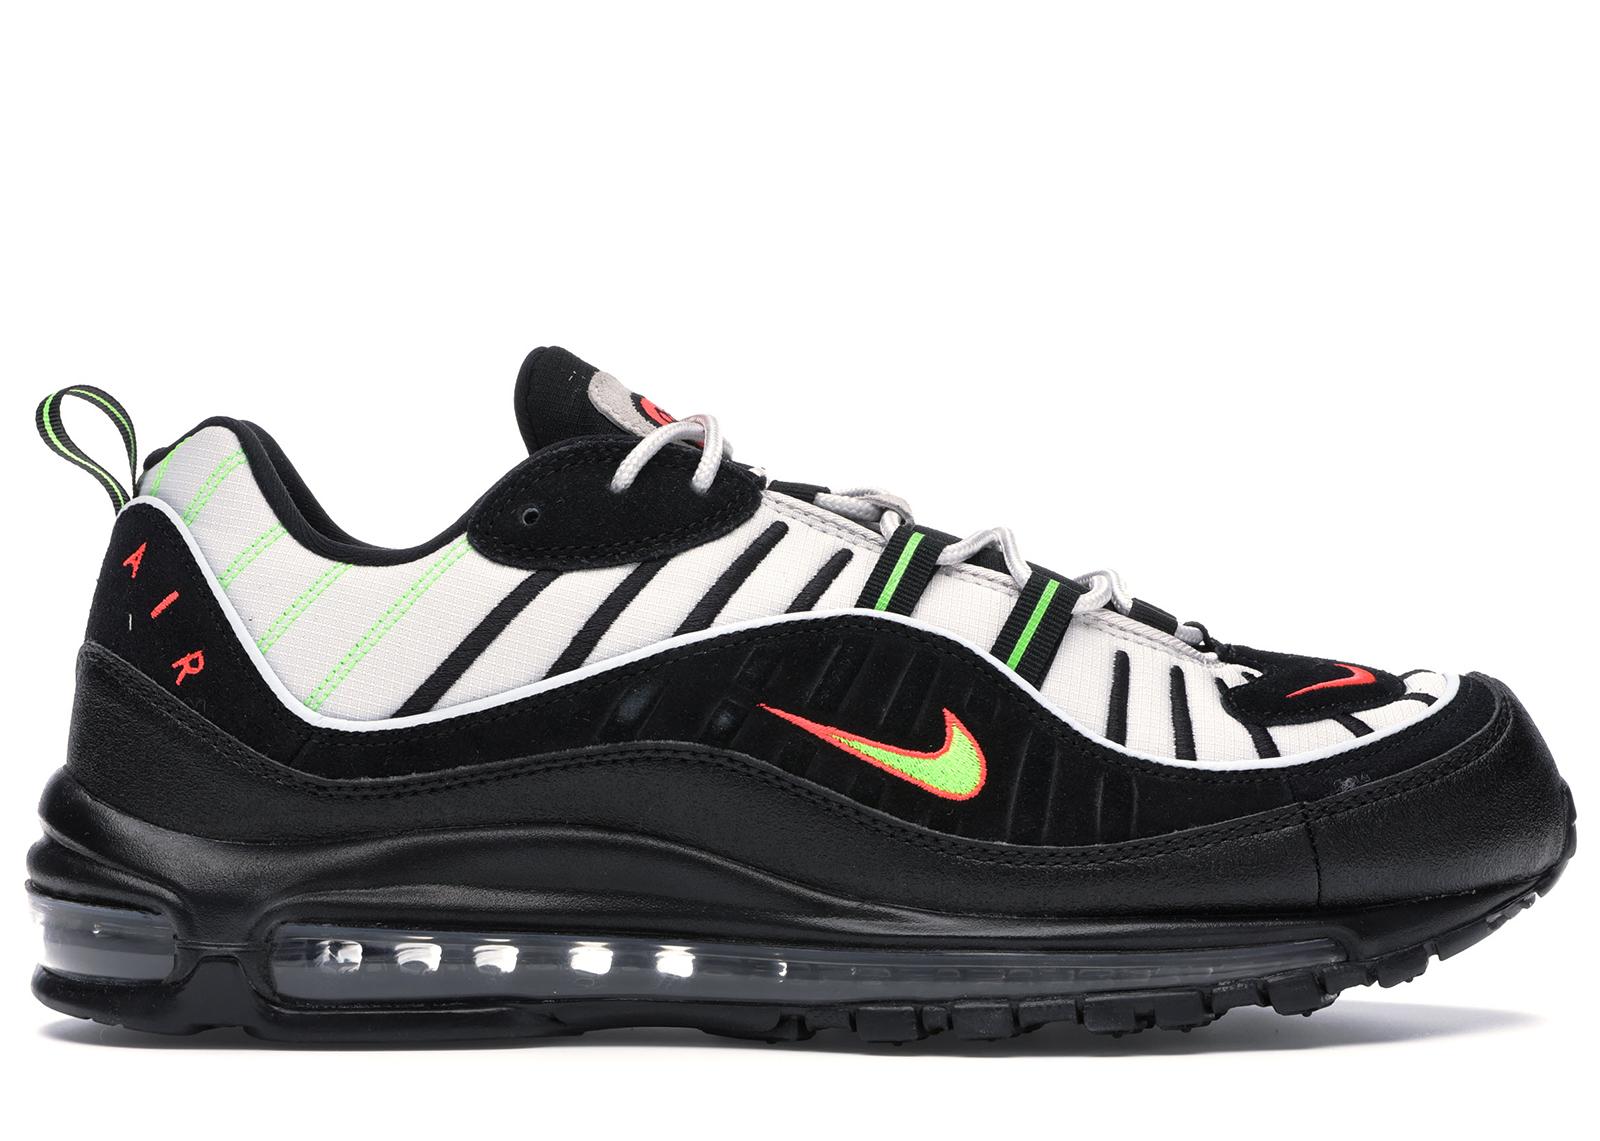 Nike Air Max 98 Highlighter - 640744-015